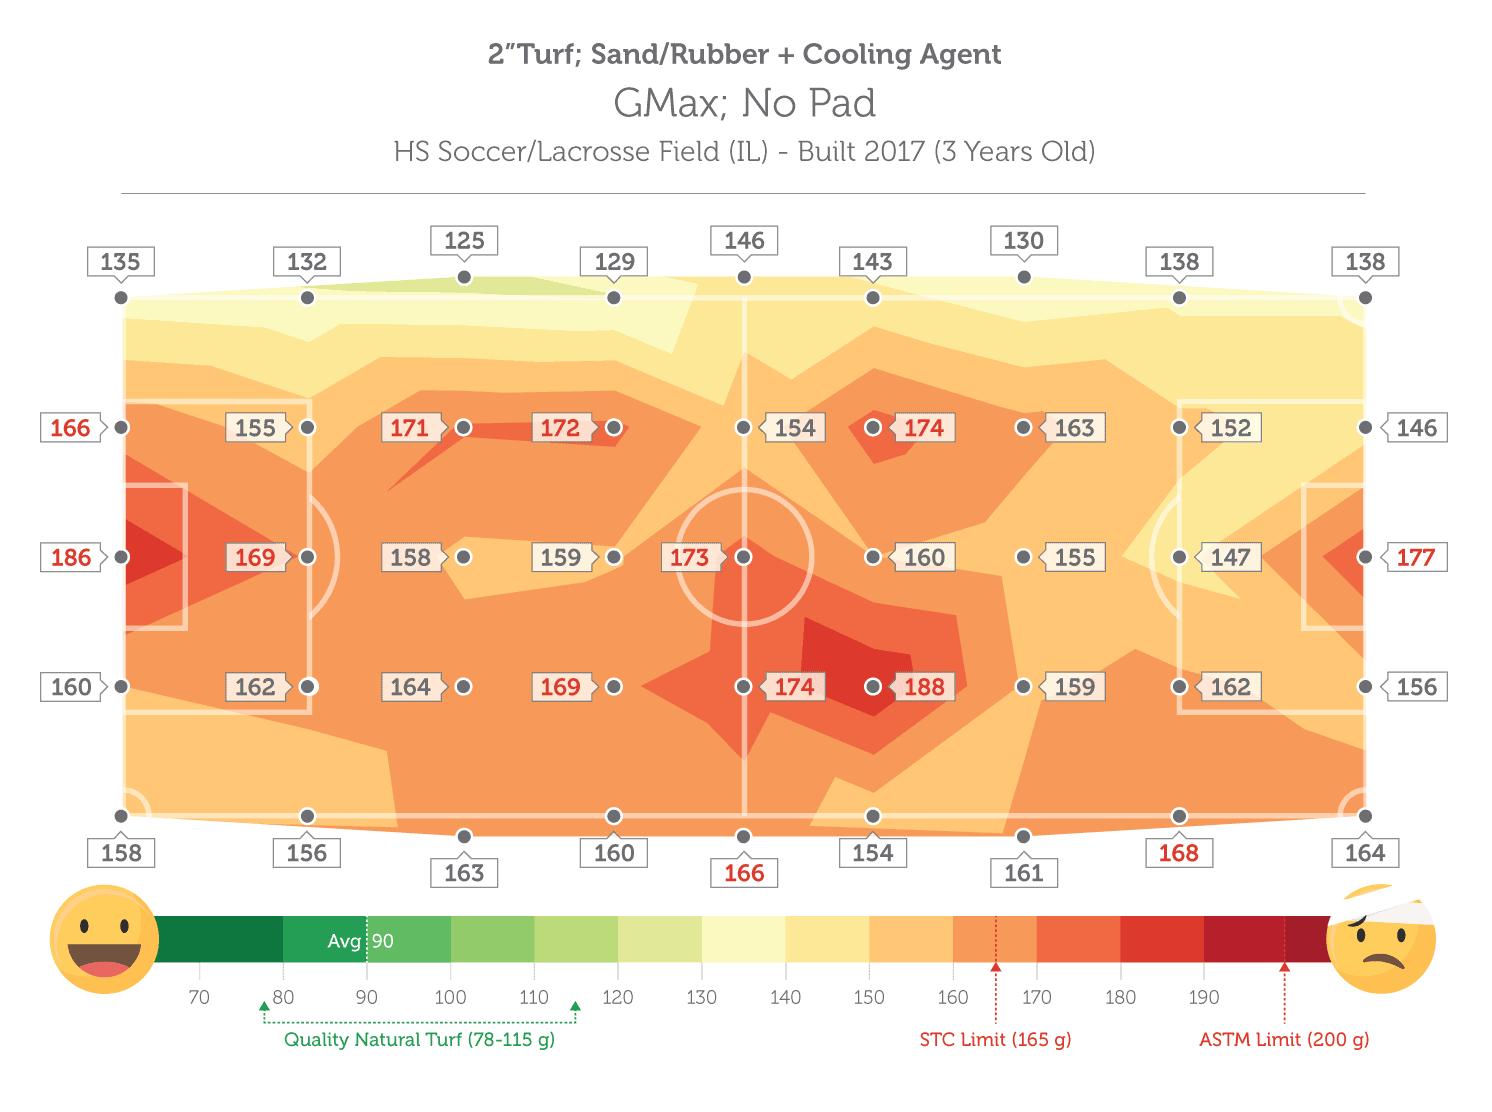 Stage-HIC-GMax-Comparison-Chart-Final-Fenwick-2020-Dan-GENERIC-B-1